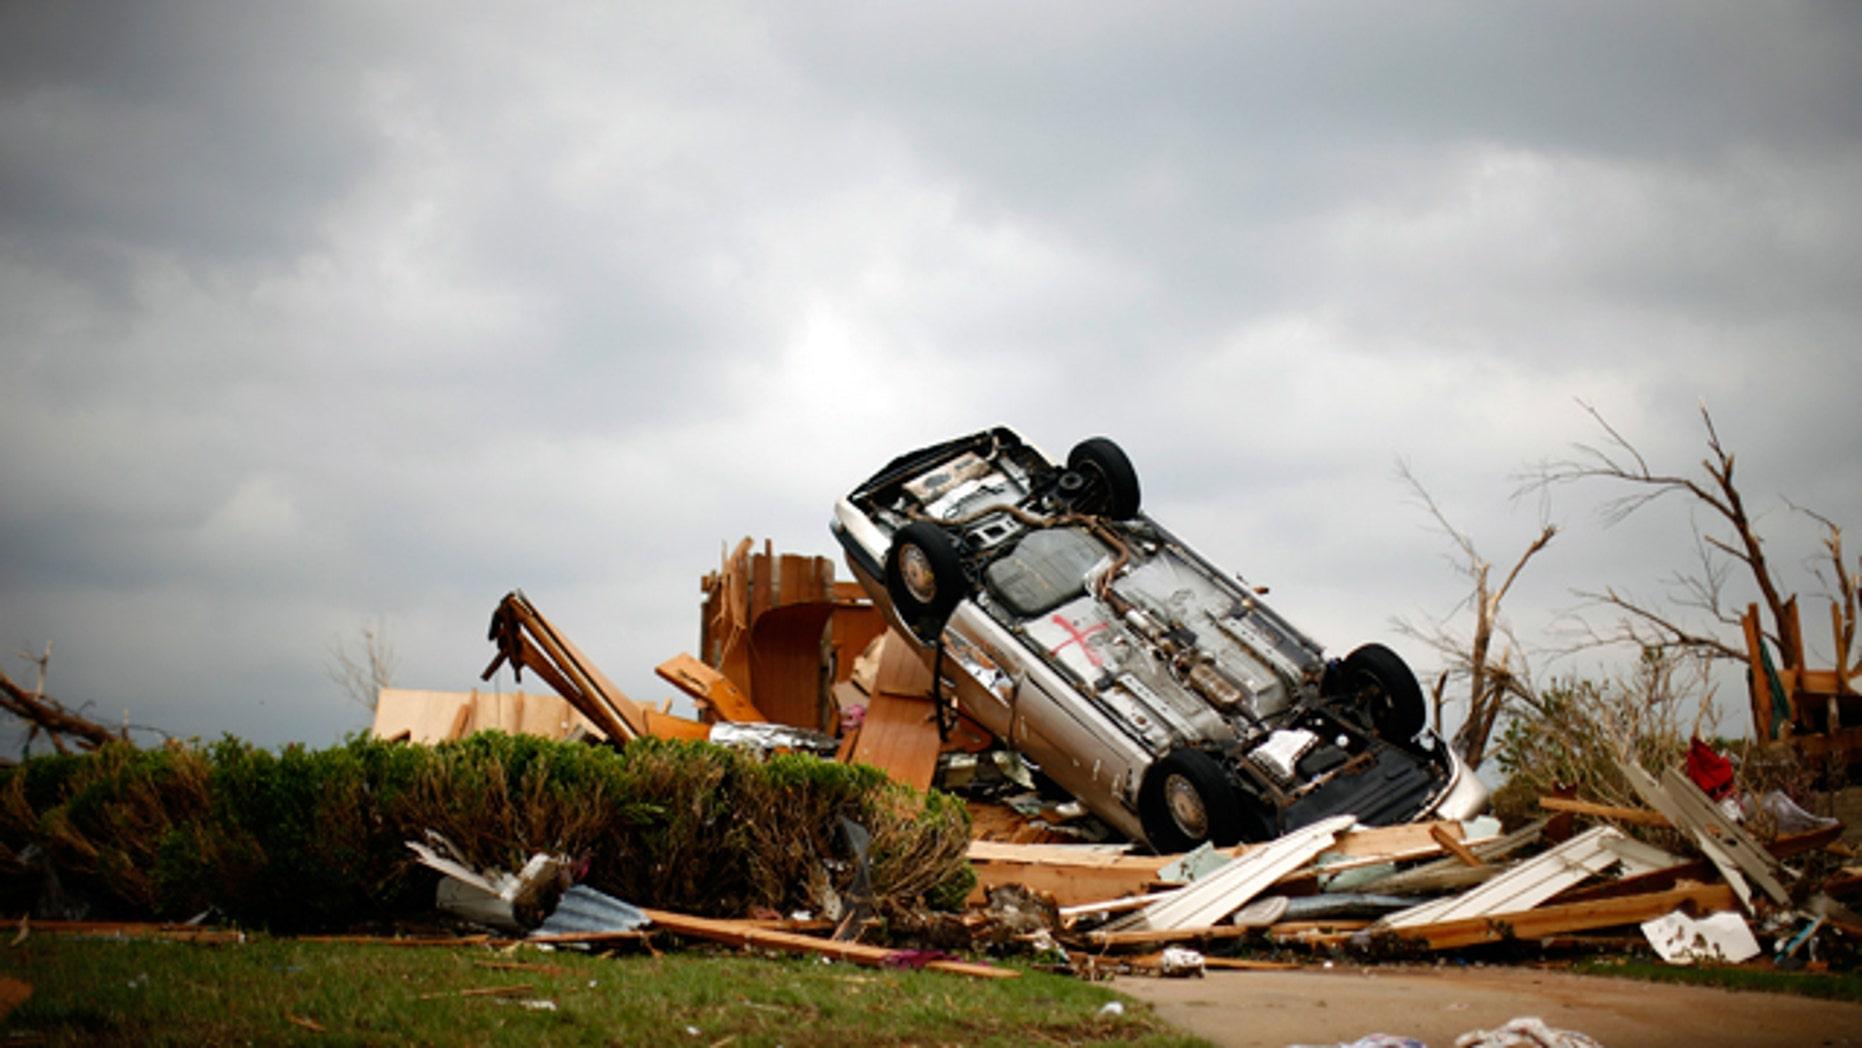 A car lies on its back, overturned by a tornado that struck Joplin, Missouri.